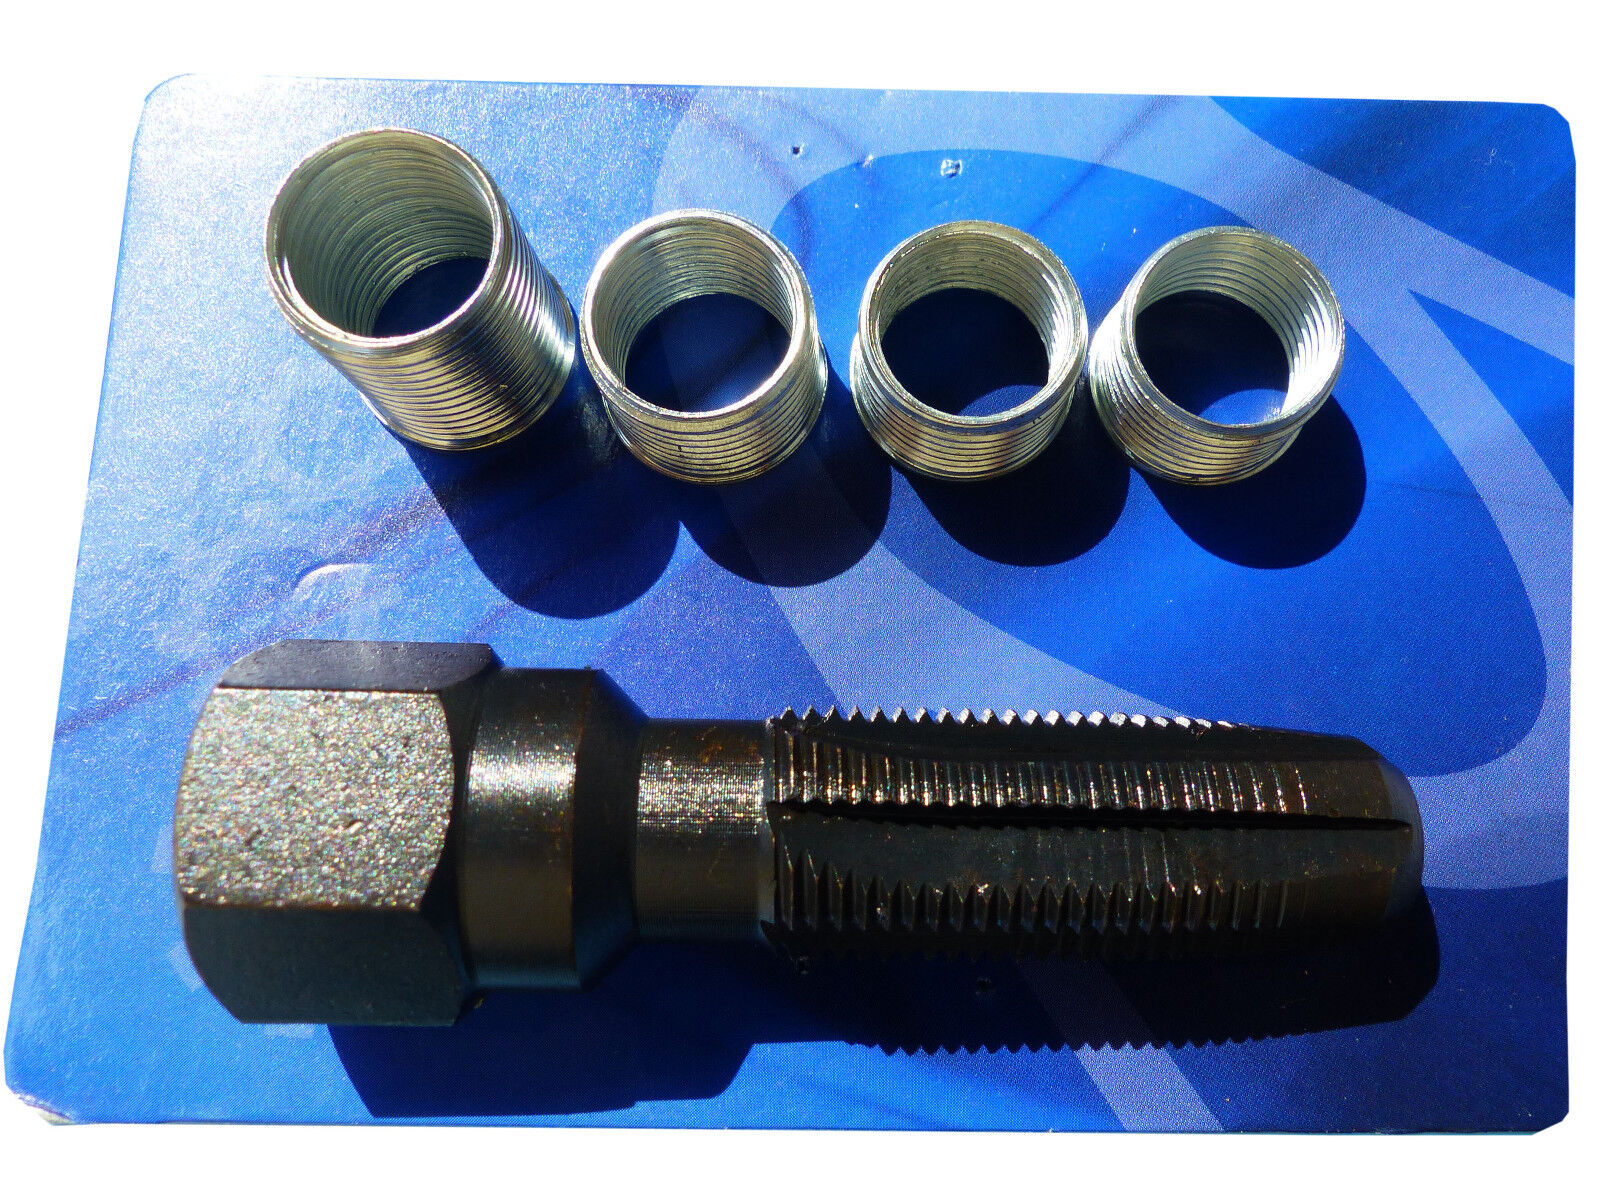 Zündkerzen Gewinde Reparatur M14x1,25 Gewindebuchsen Reparatursatz Gewindebohrer